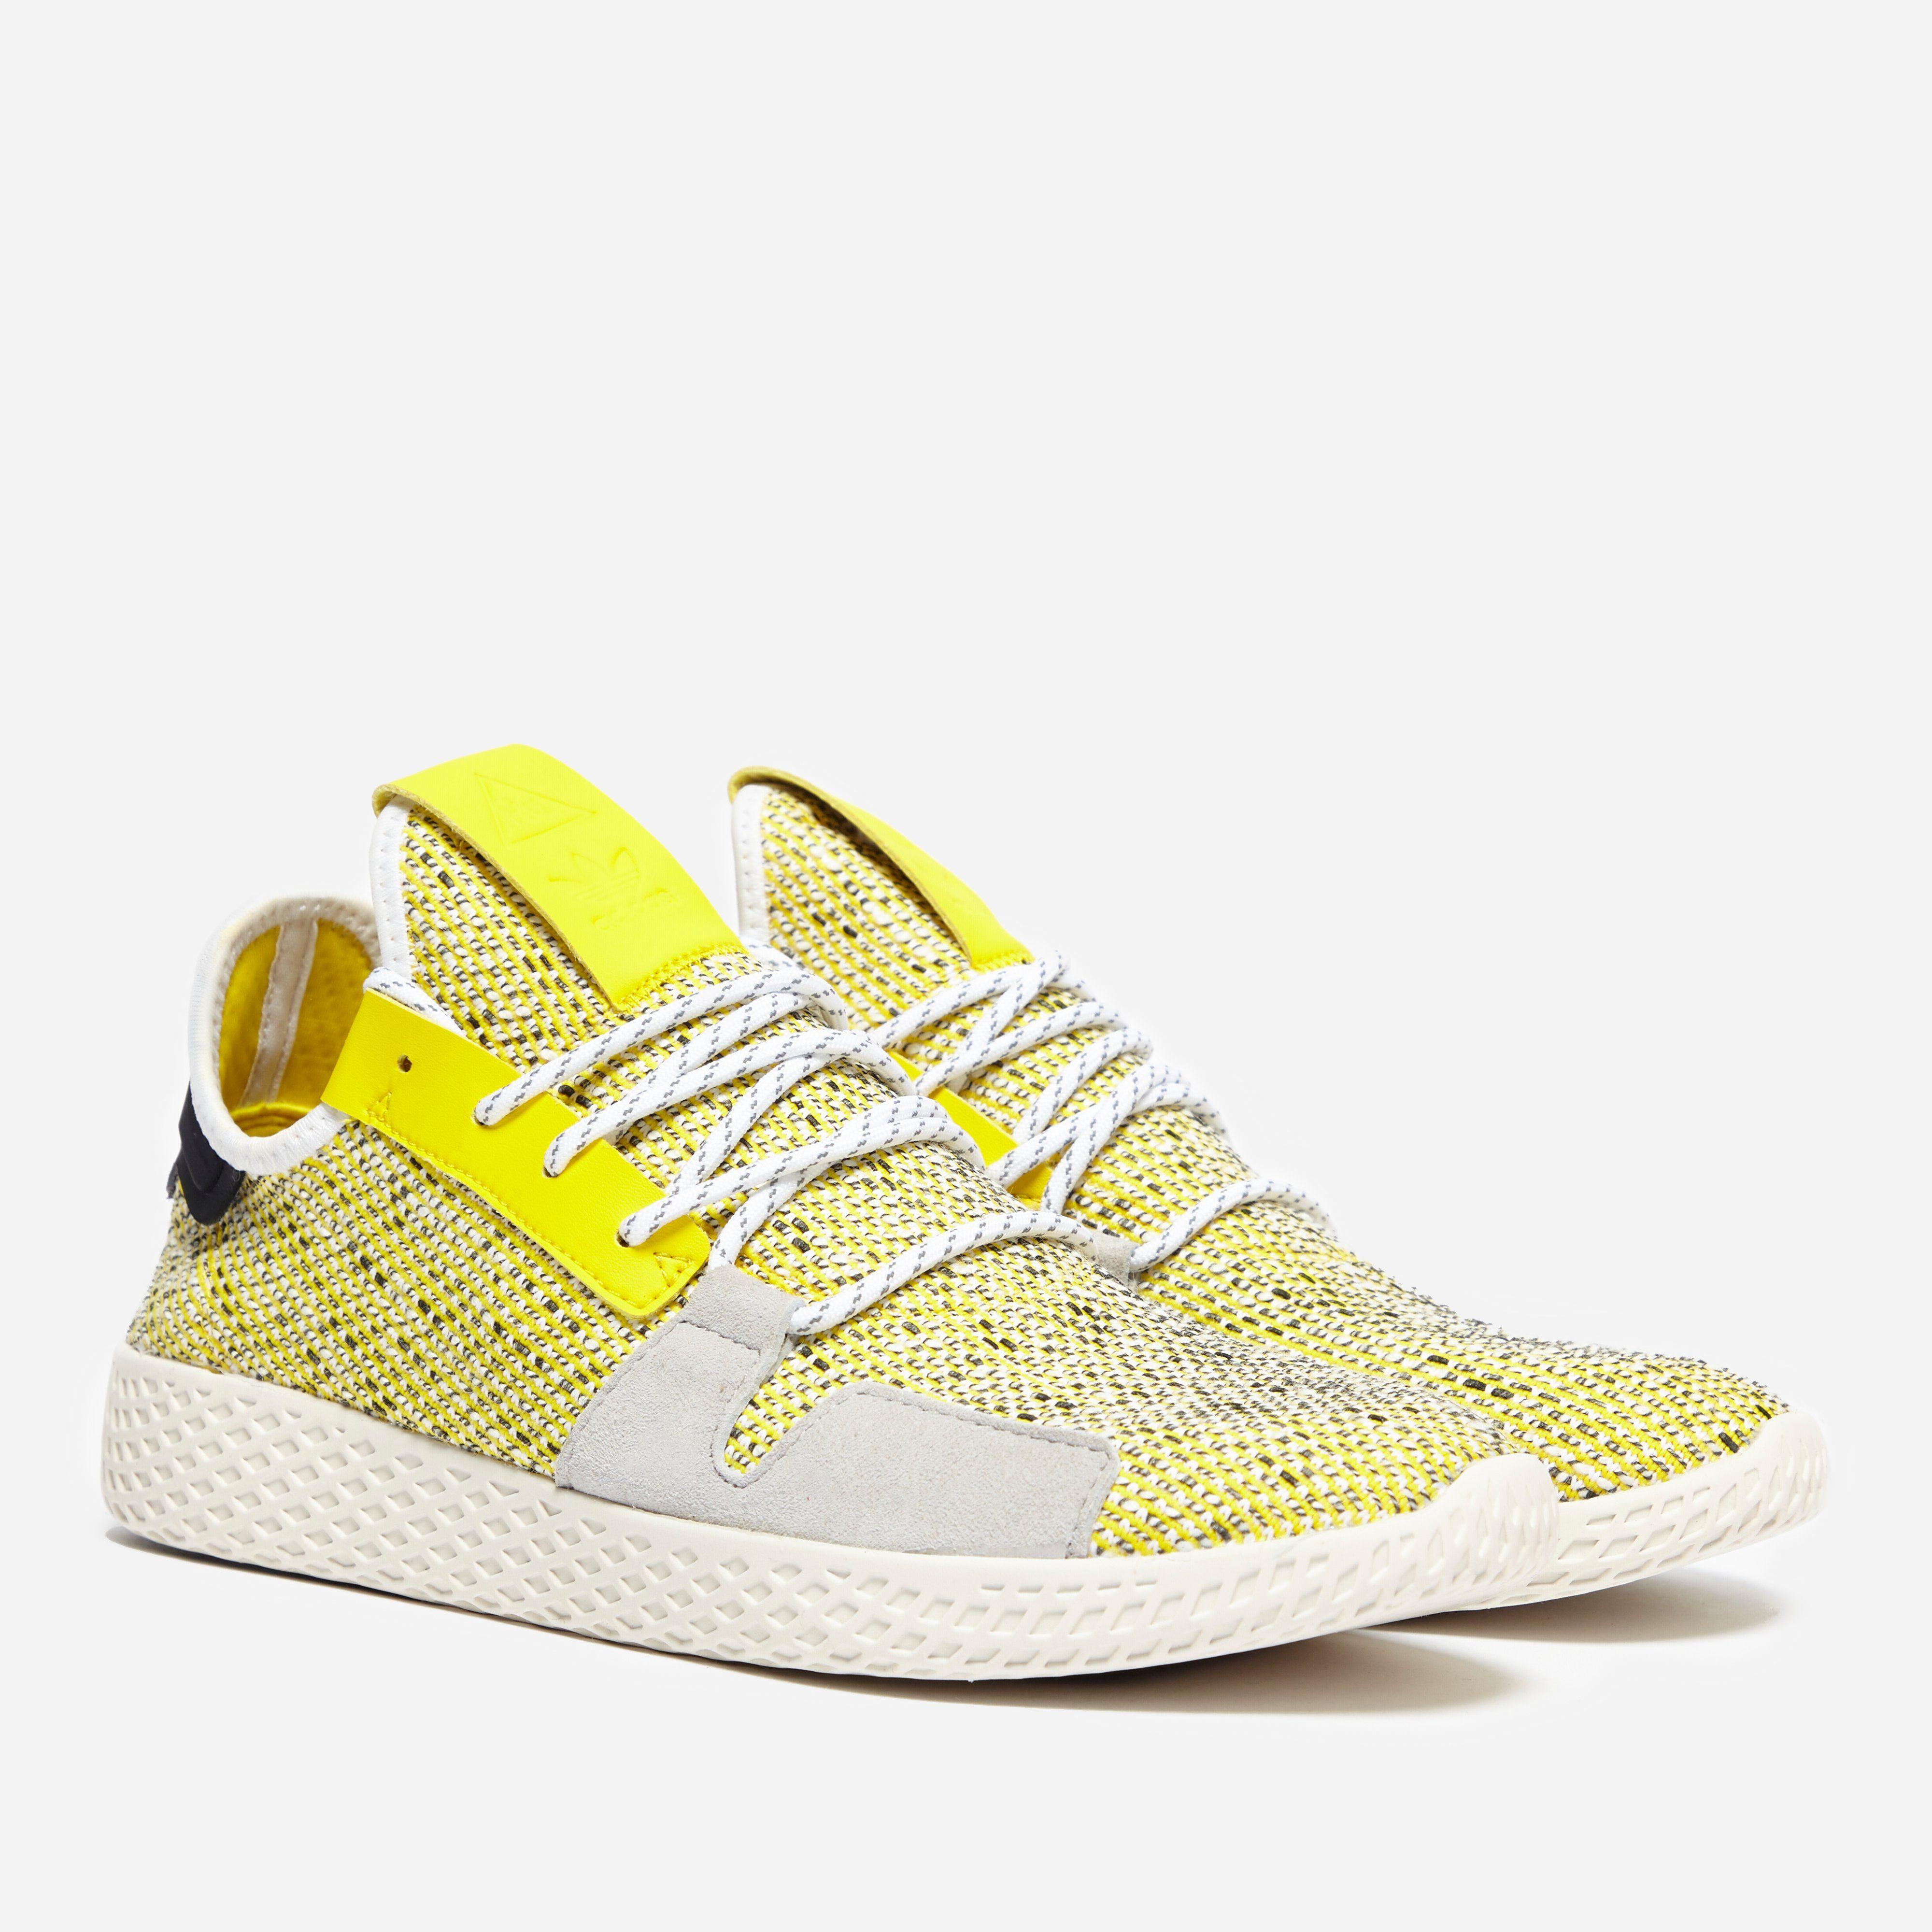 adidas Originals x Pharrell Williams Solar HU Tennis V2 'Afro Pack'